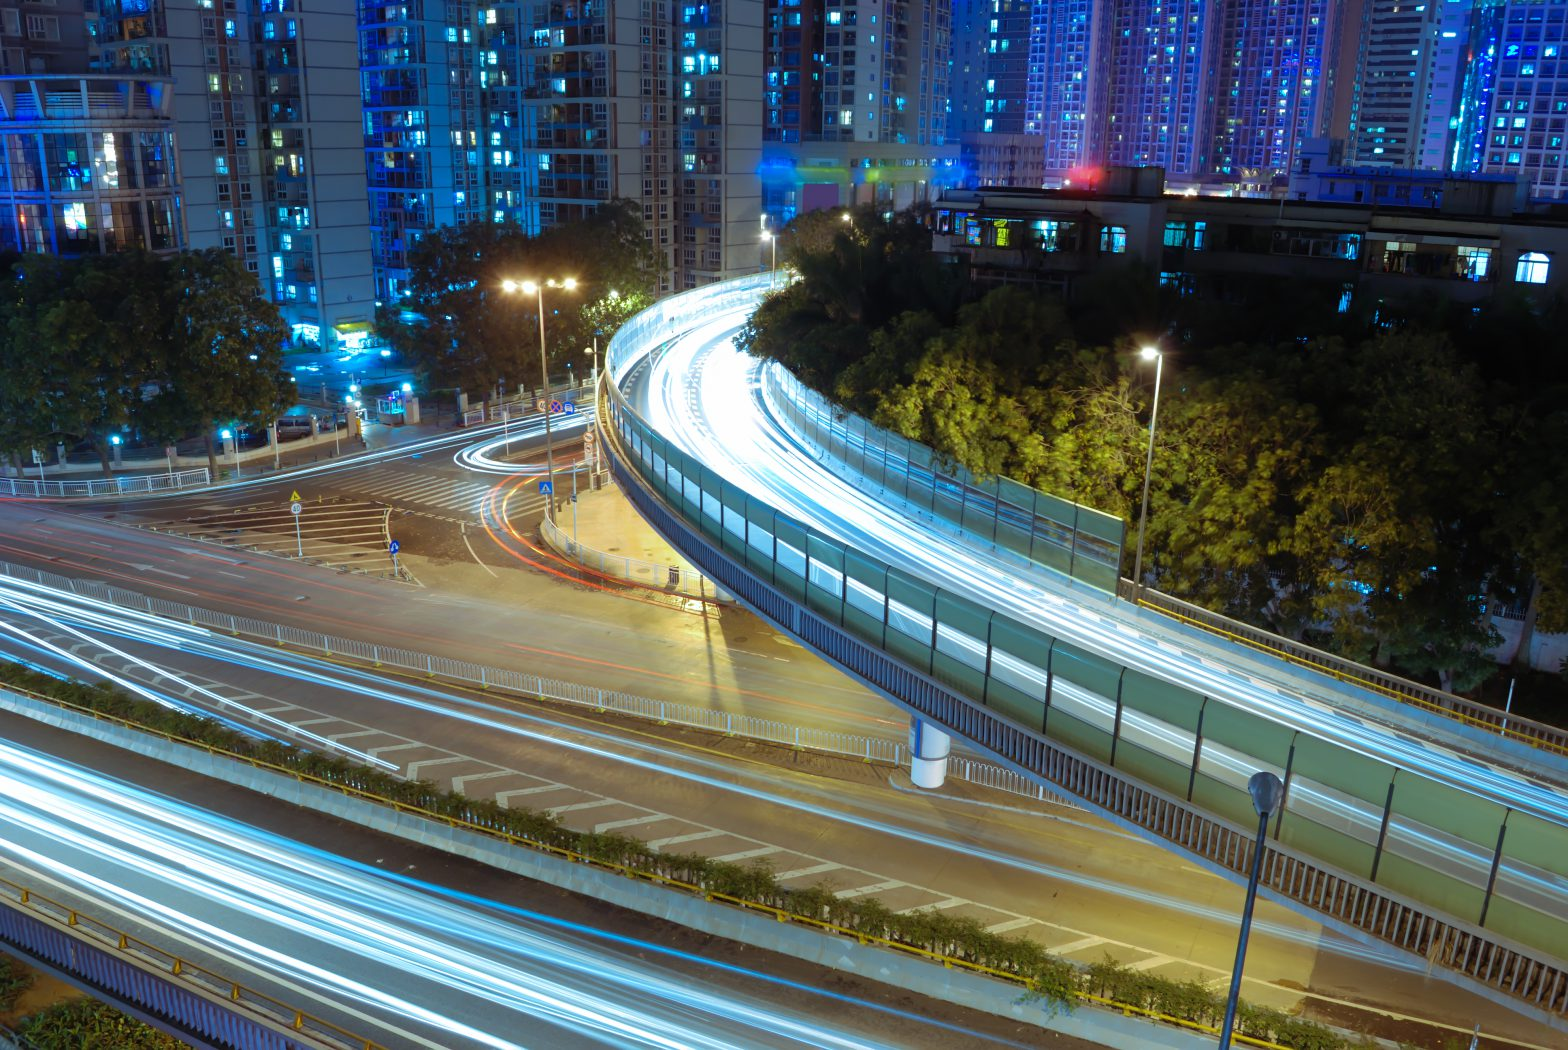 modern urban landscape at night